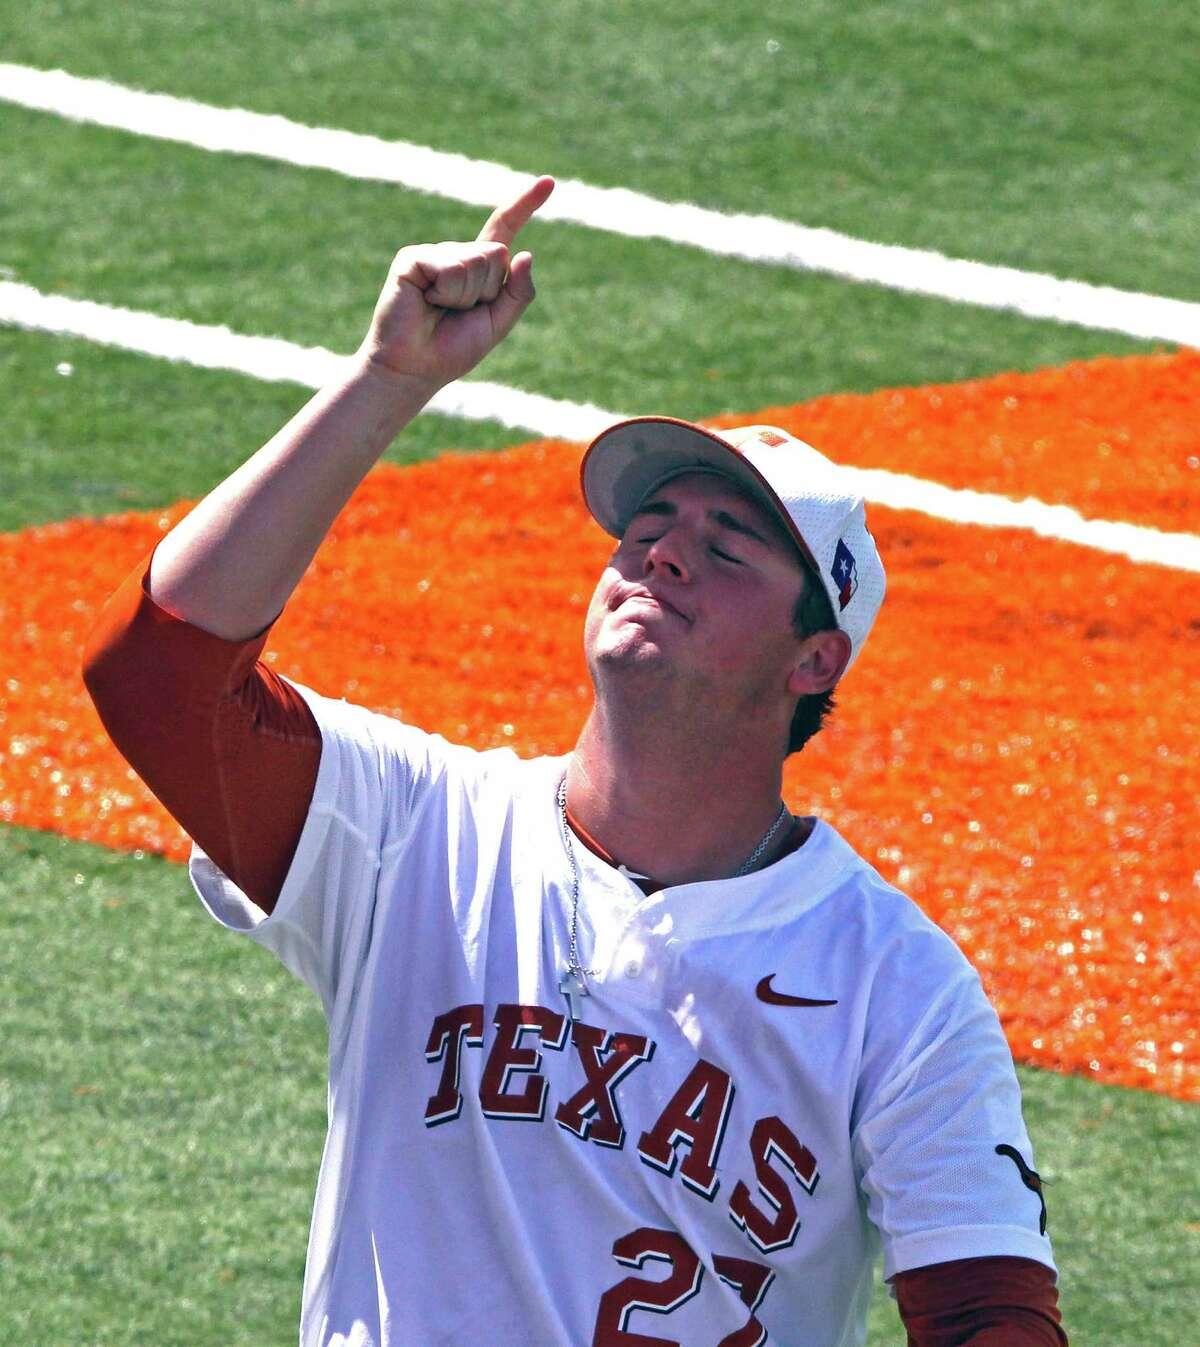 Texas' Travis Duke points to the sky after Texas defeats Houston in an NCAA college baseball super regional tournament in Austin, Texas, Sat., June 7, 2014. (AP Photo/Michael Thomas)